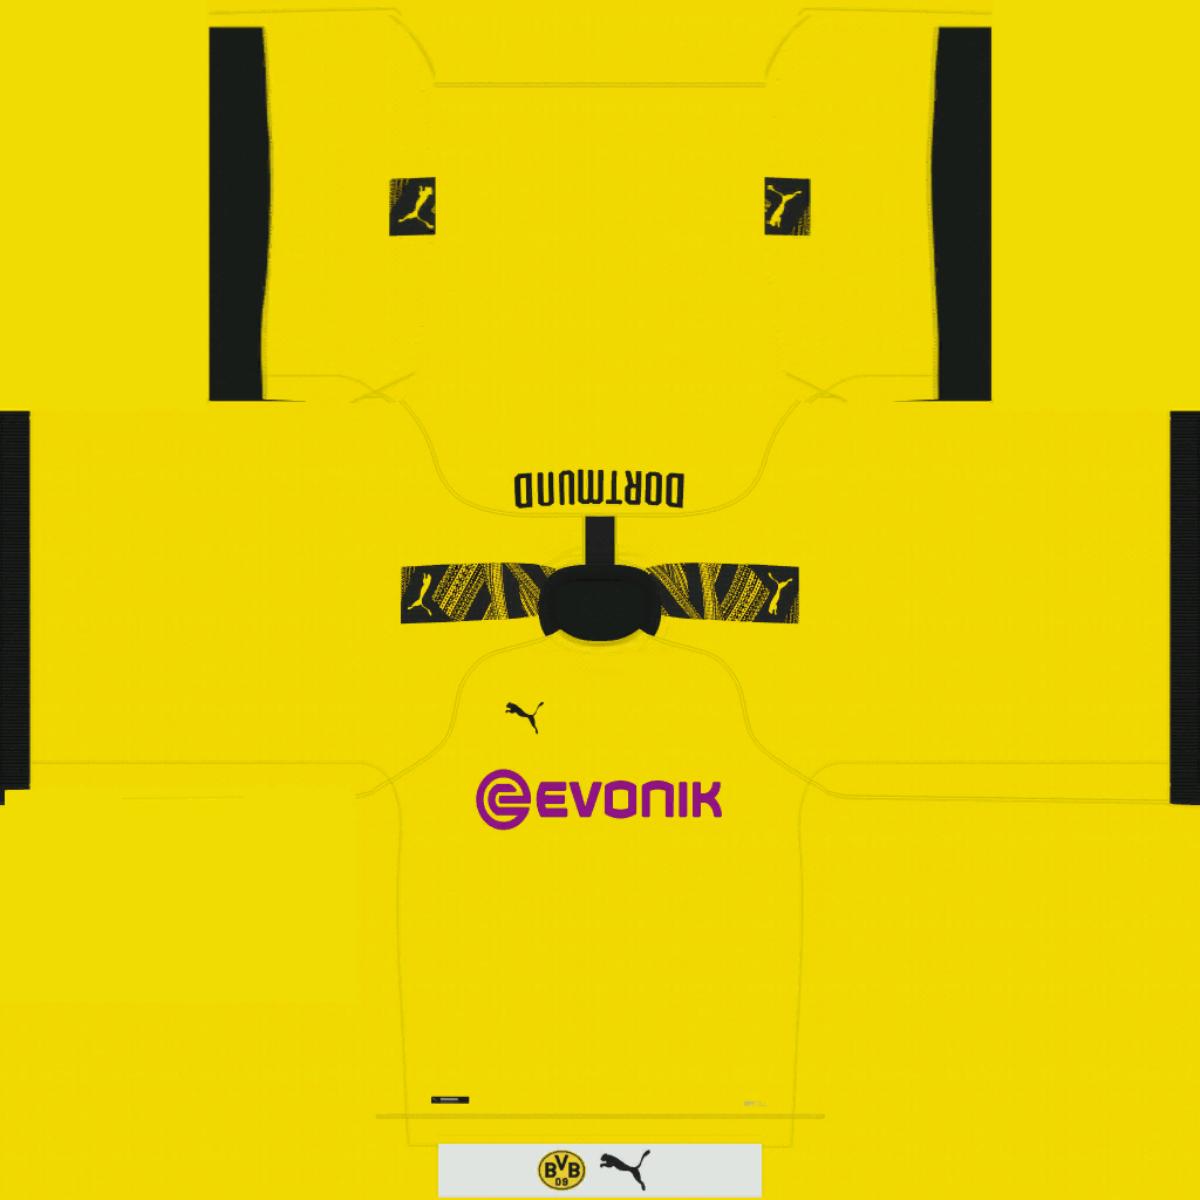 Kits Borussia Dortmund 19 20 Bundesliga Kits Fifamoro